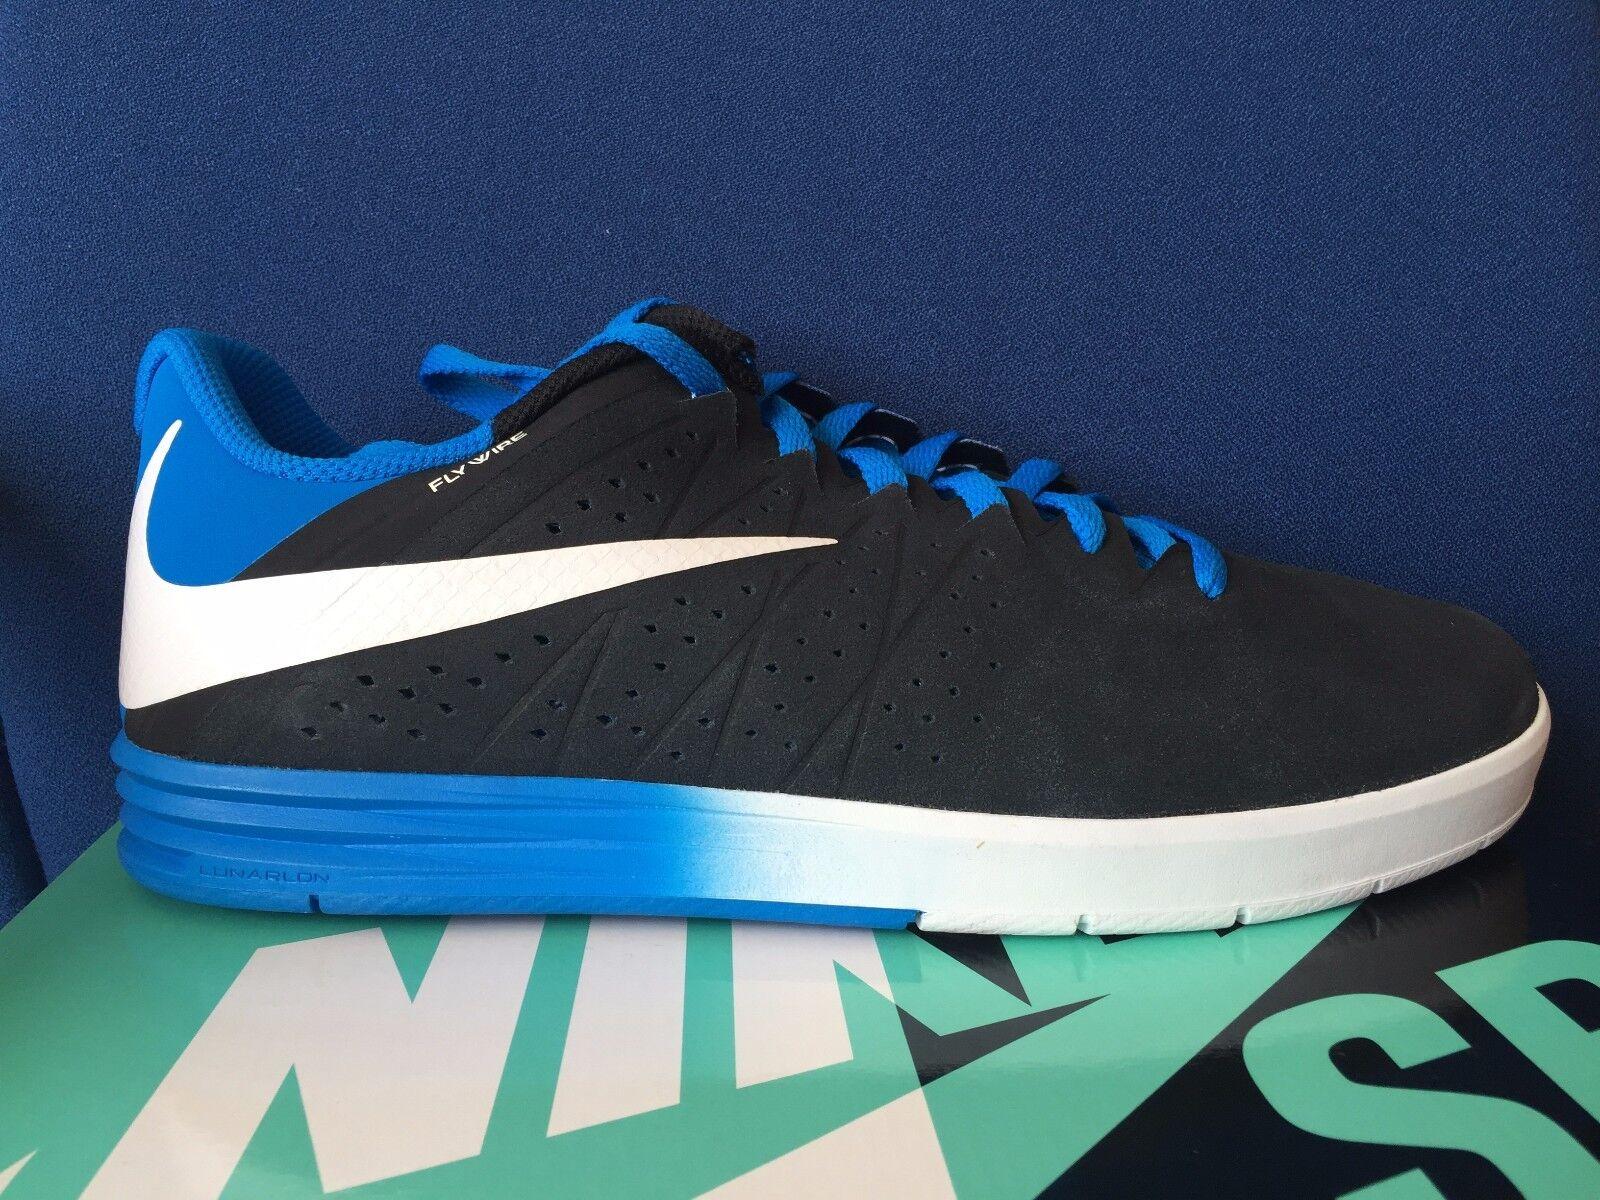 Nike Paul Rodriguez 654863-014 CTD SB sz 12 Black/White-Photo Blue 654863-014 Rodriguez Skate Shoe 2da4b3